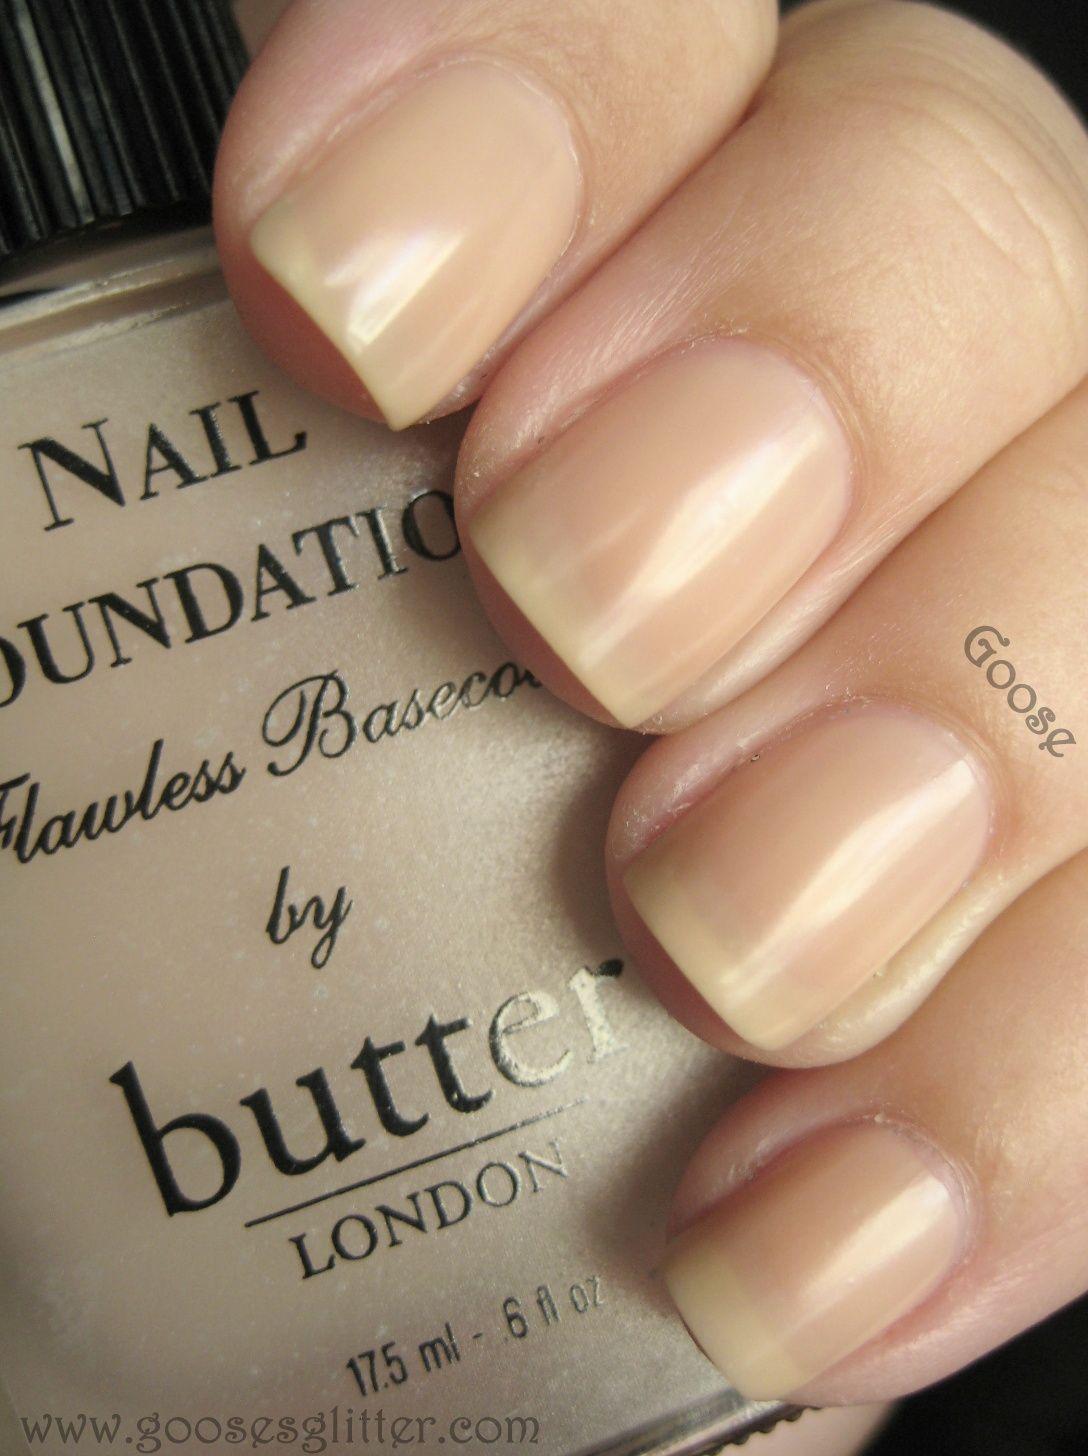 butterLONDON - Nail Foundation Flawless Basecoat / GoosesGlitter [I ...